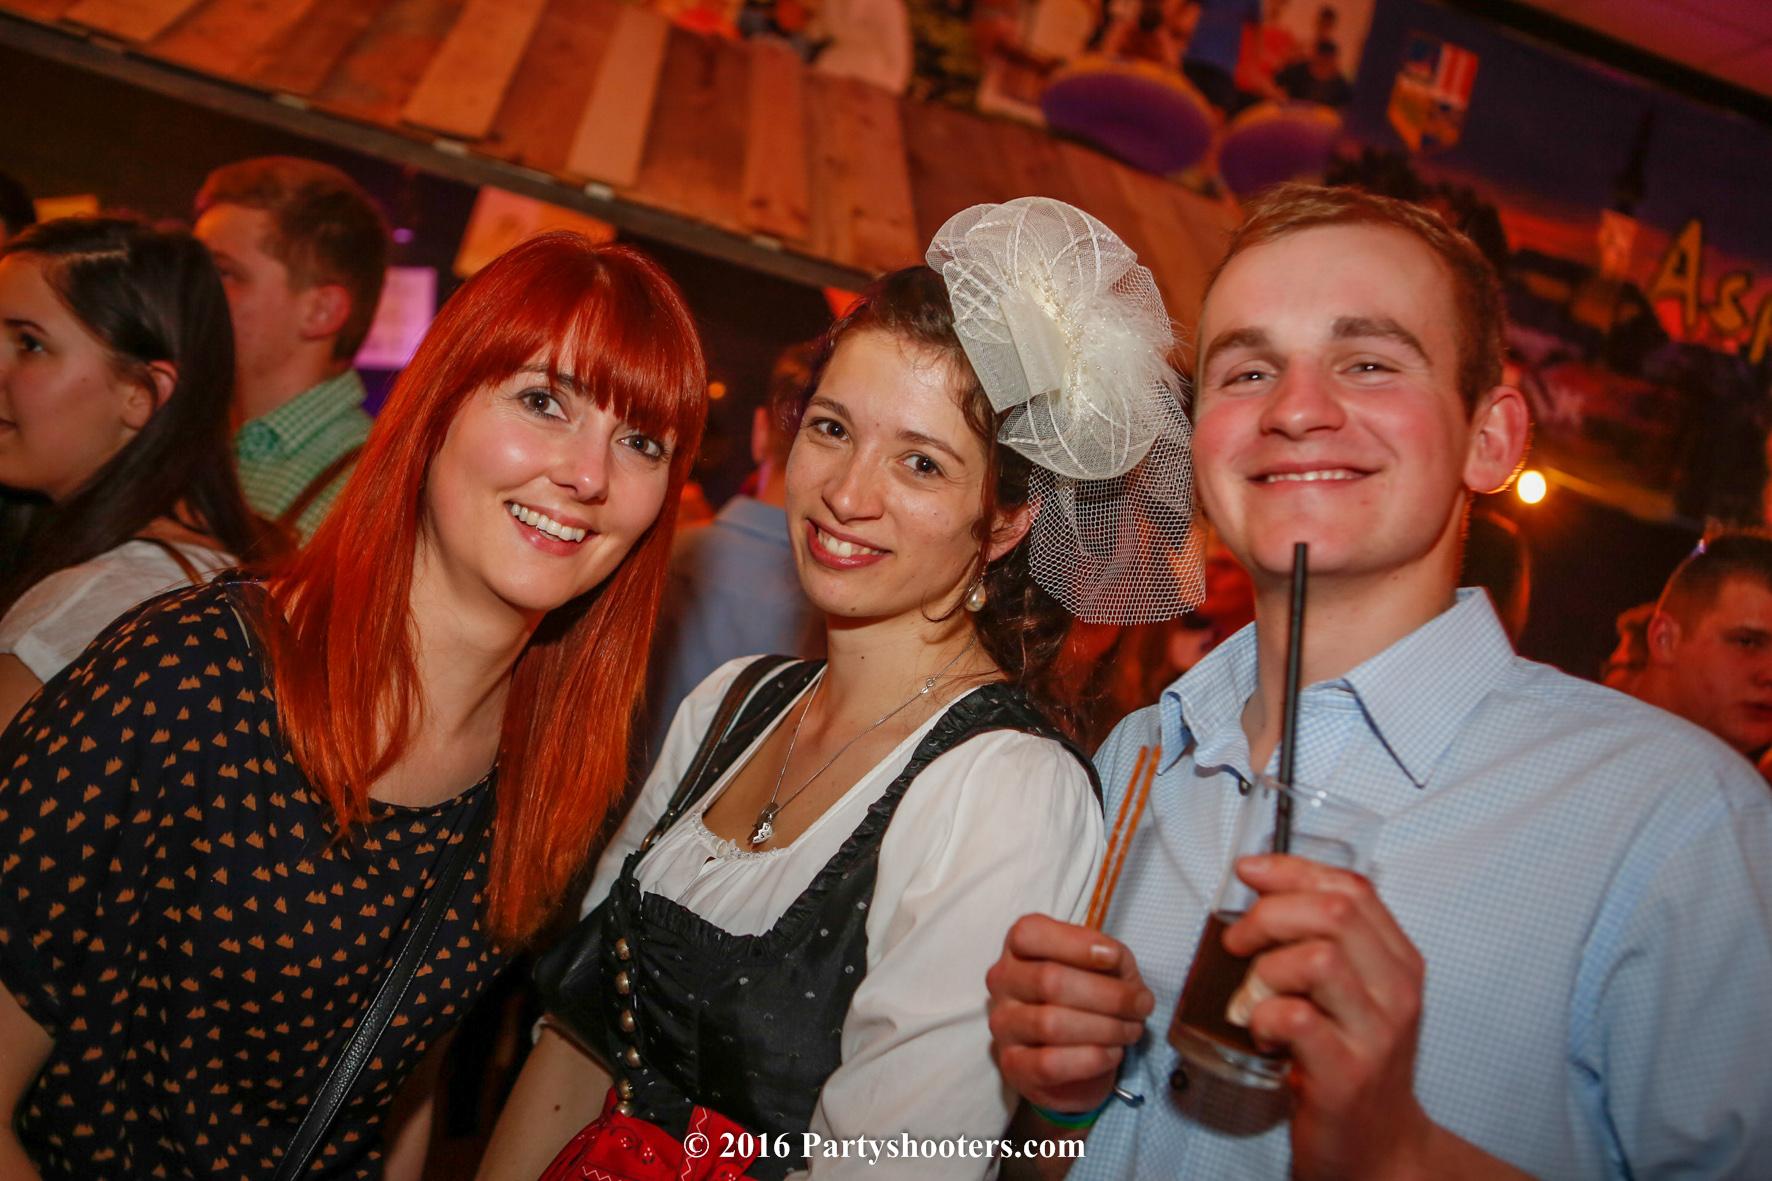 0103 - 4120 - Fruehlingsball Aspach